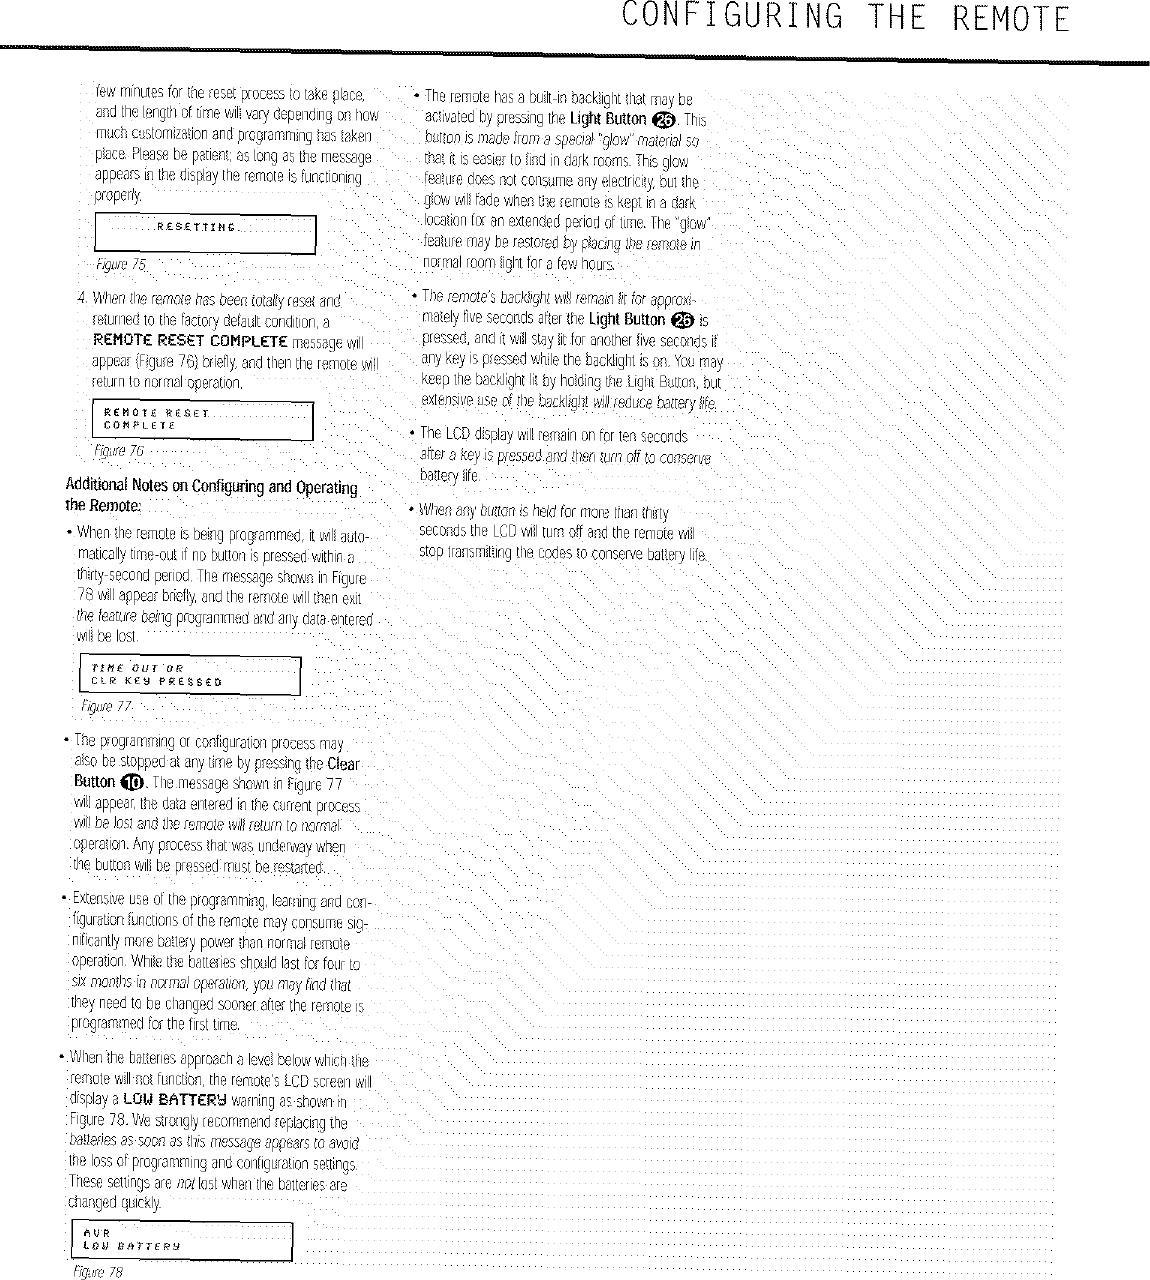 HARMAN KARDON Receivers Manual L0312067